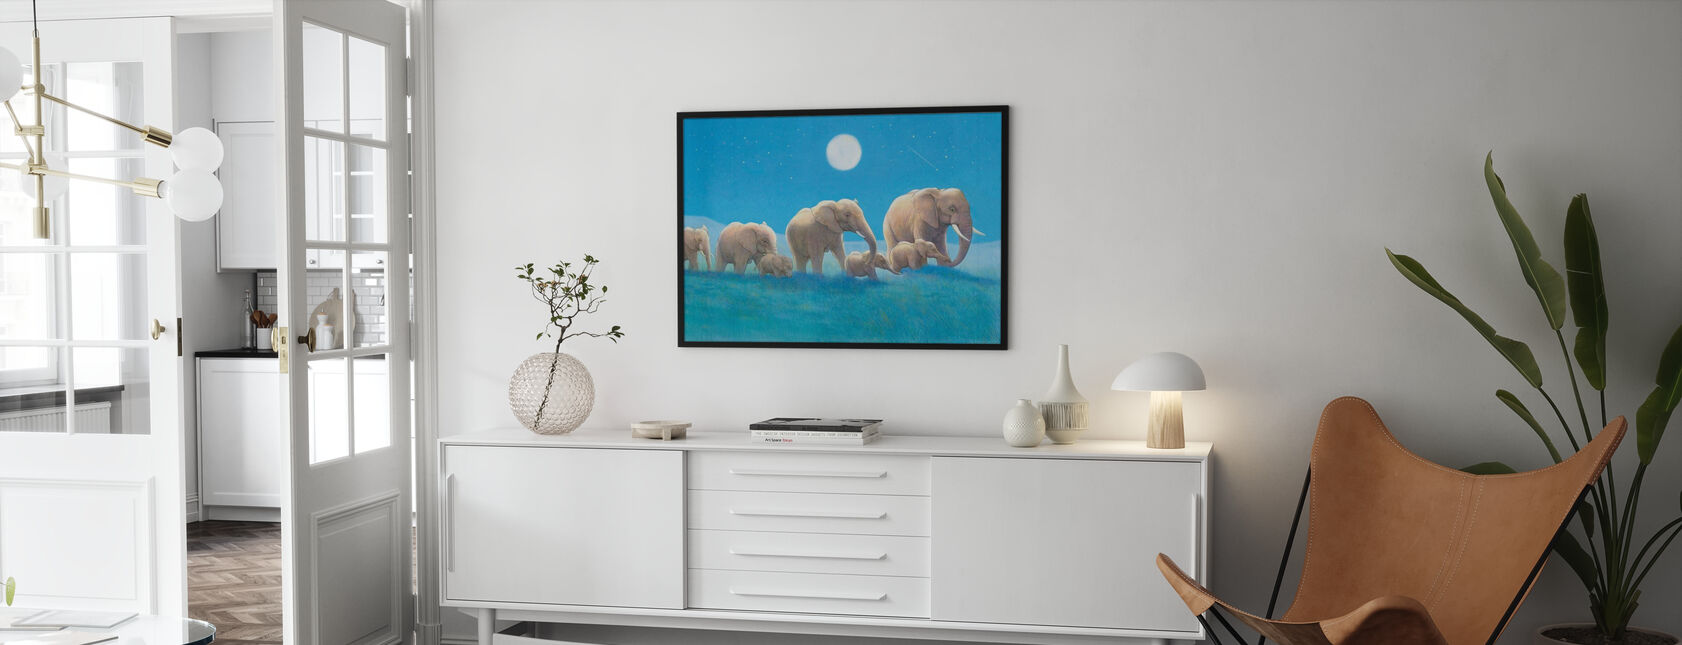 Olifanten lopen - Ingelijste print - Woonkamer